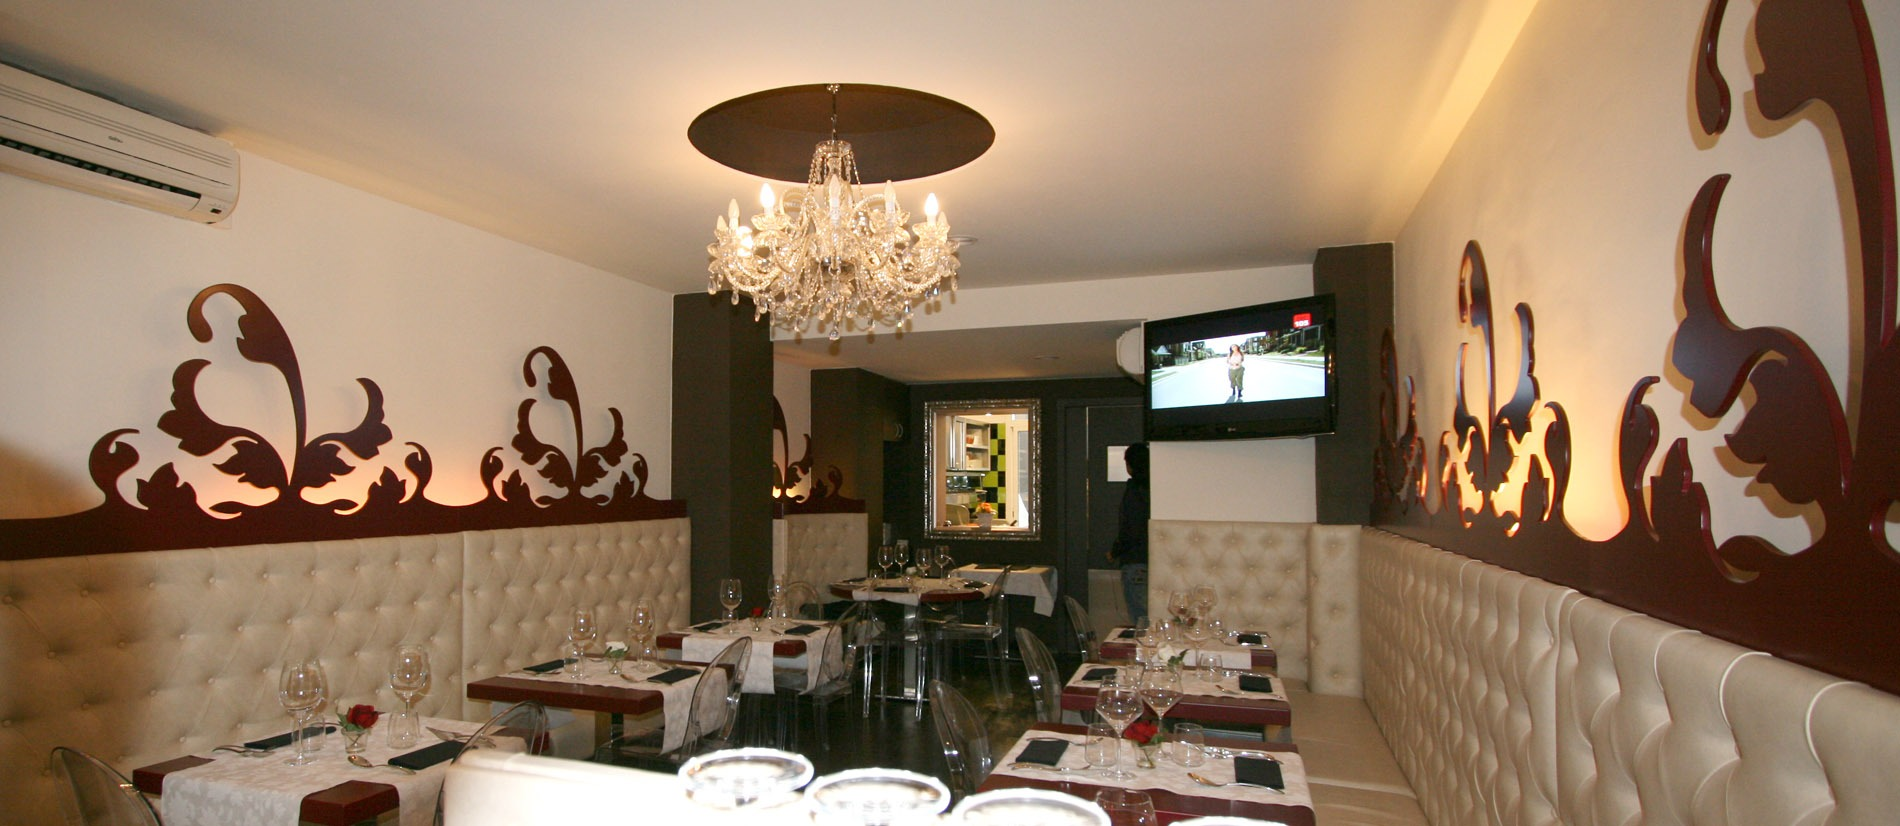 314BCN_Restaurante-Solepizzamore-1